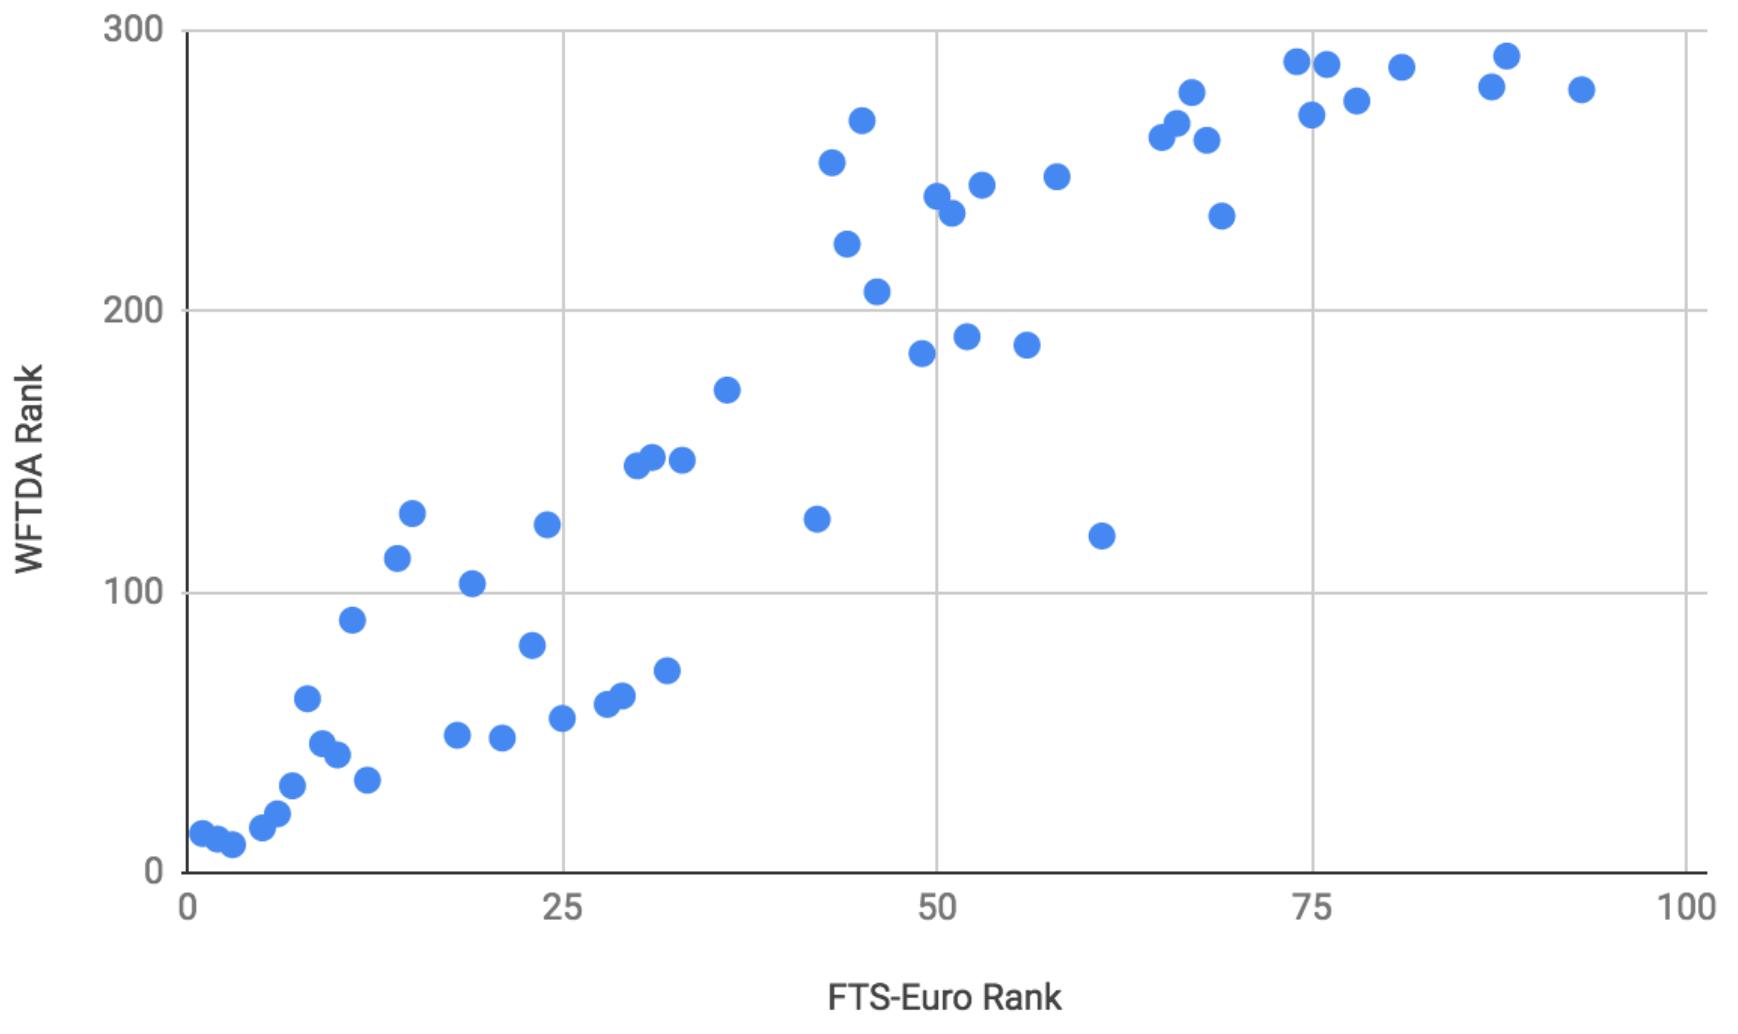 Graph of WFTDA Rank v FTS-Euro Rank